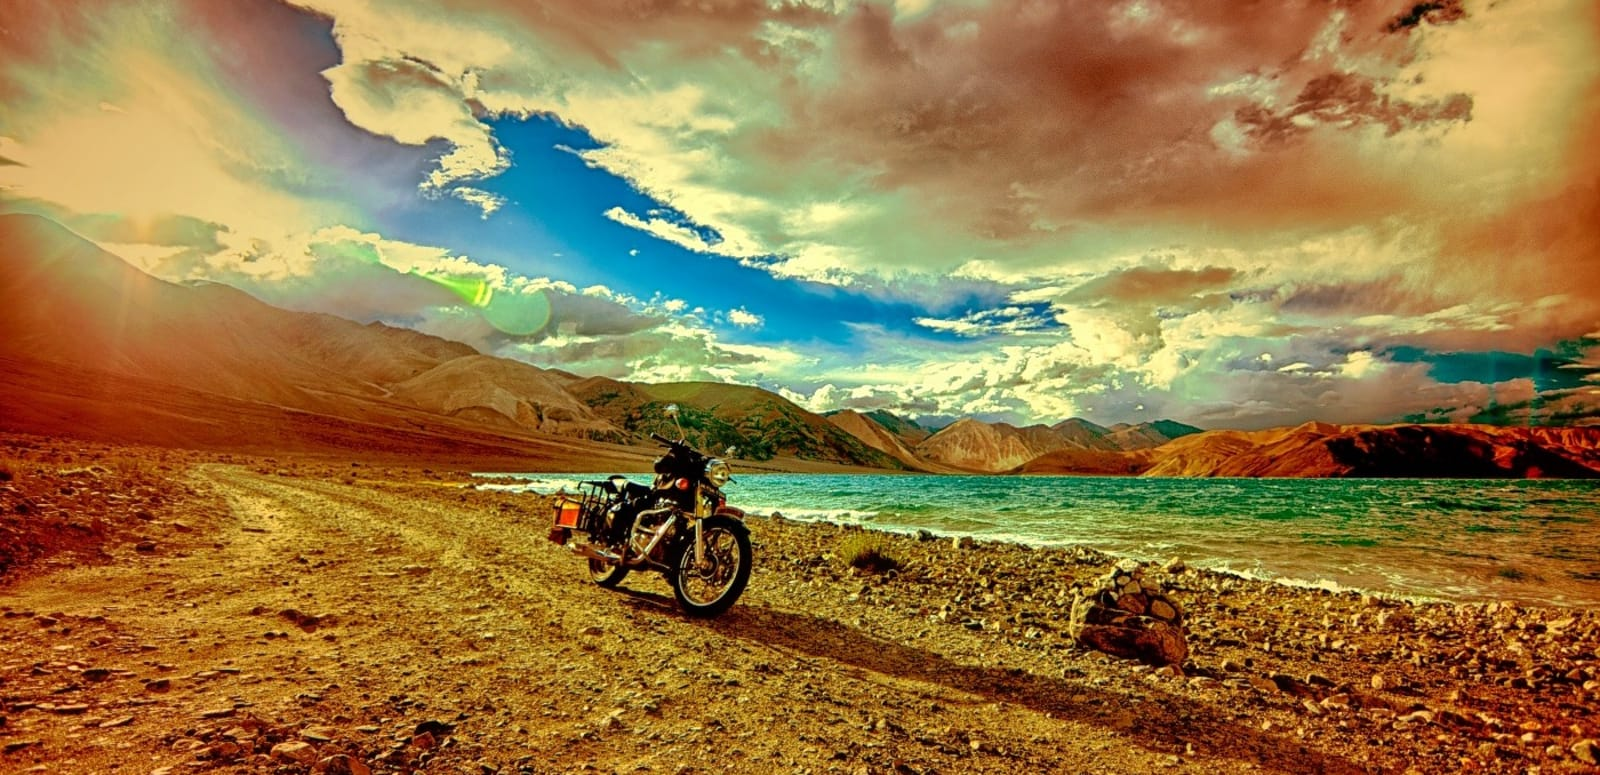 1463259871_ladakh.jpg